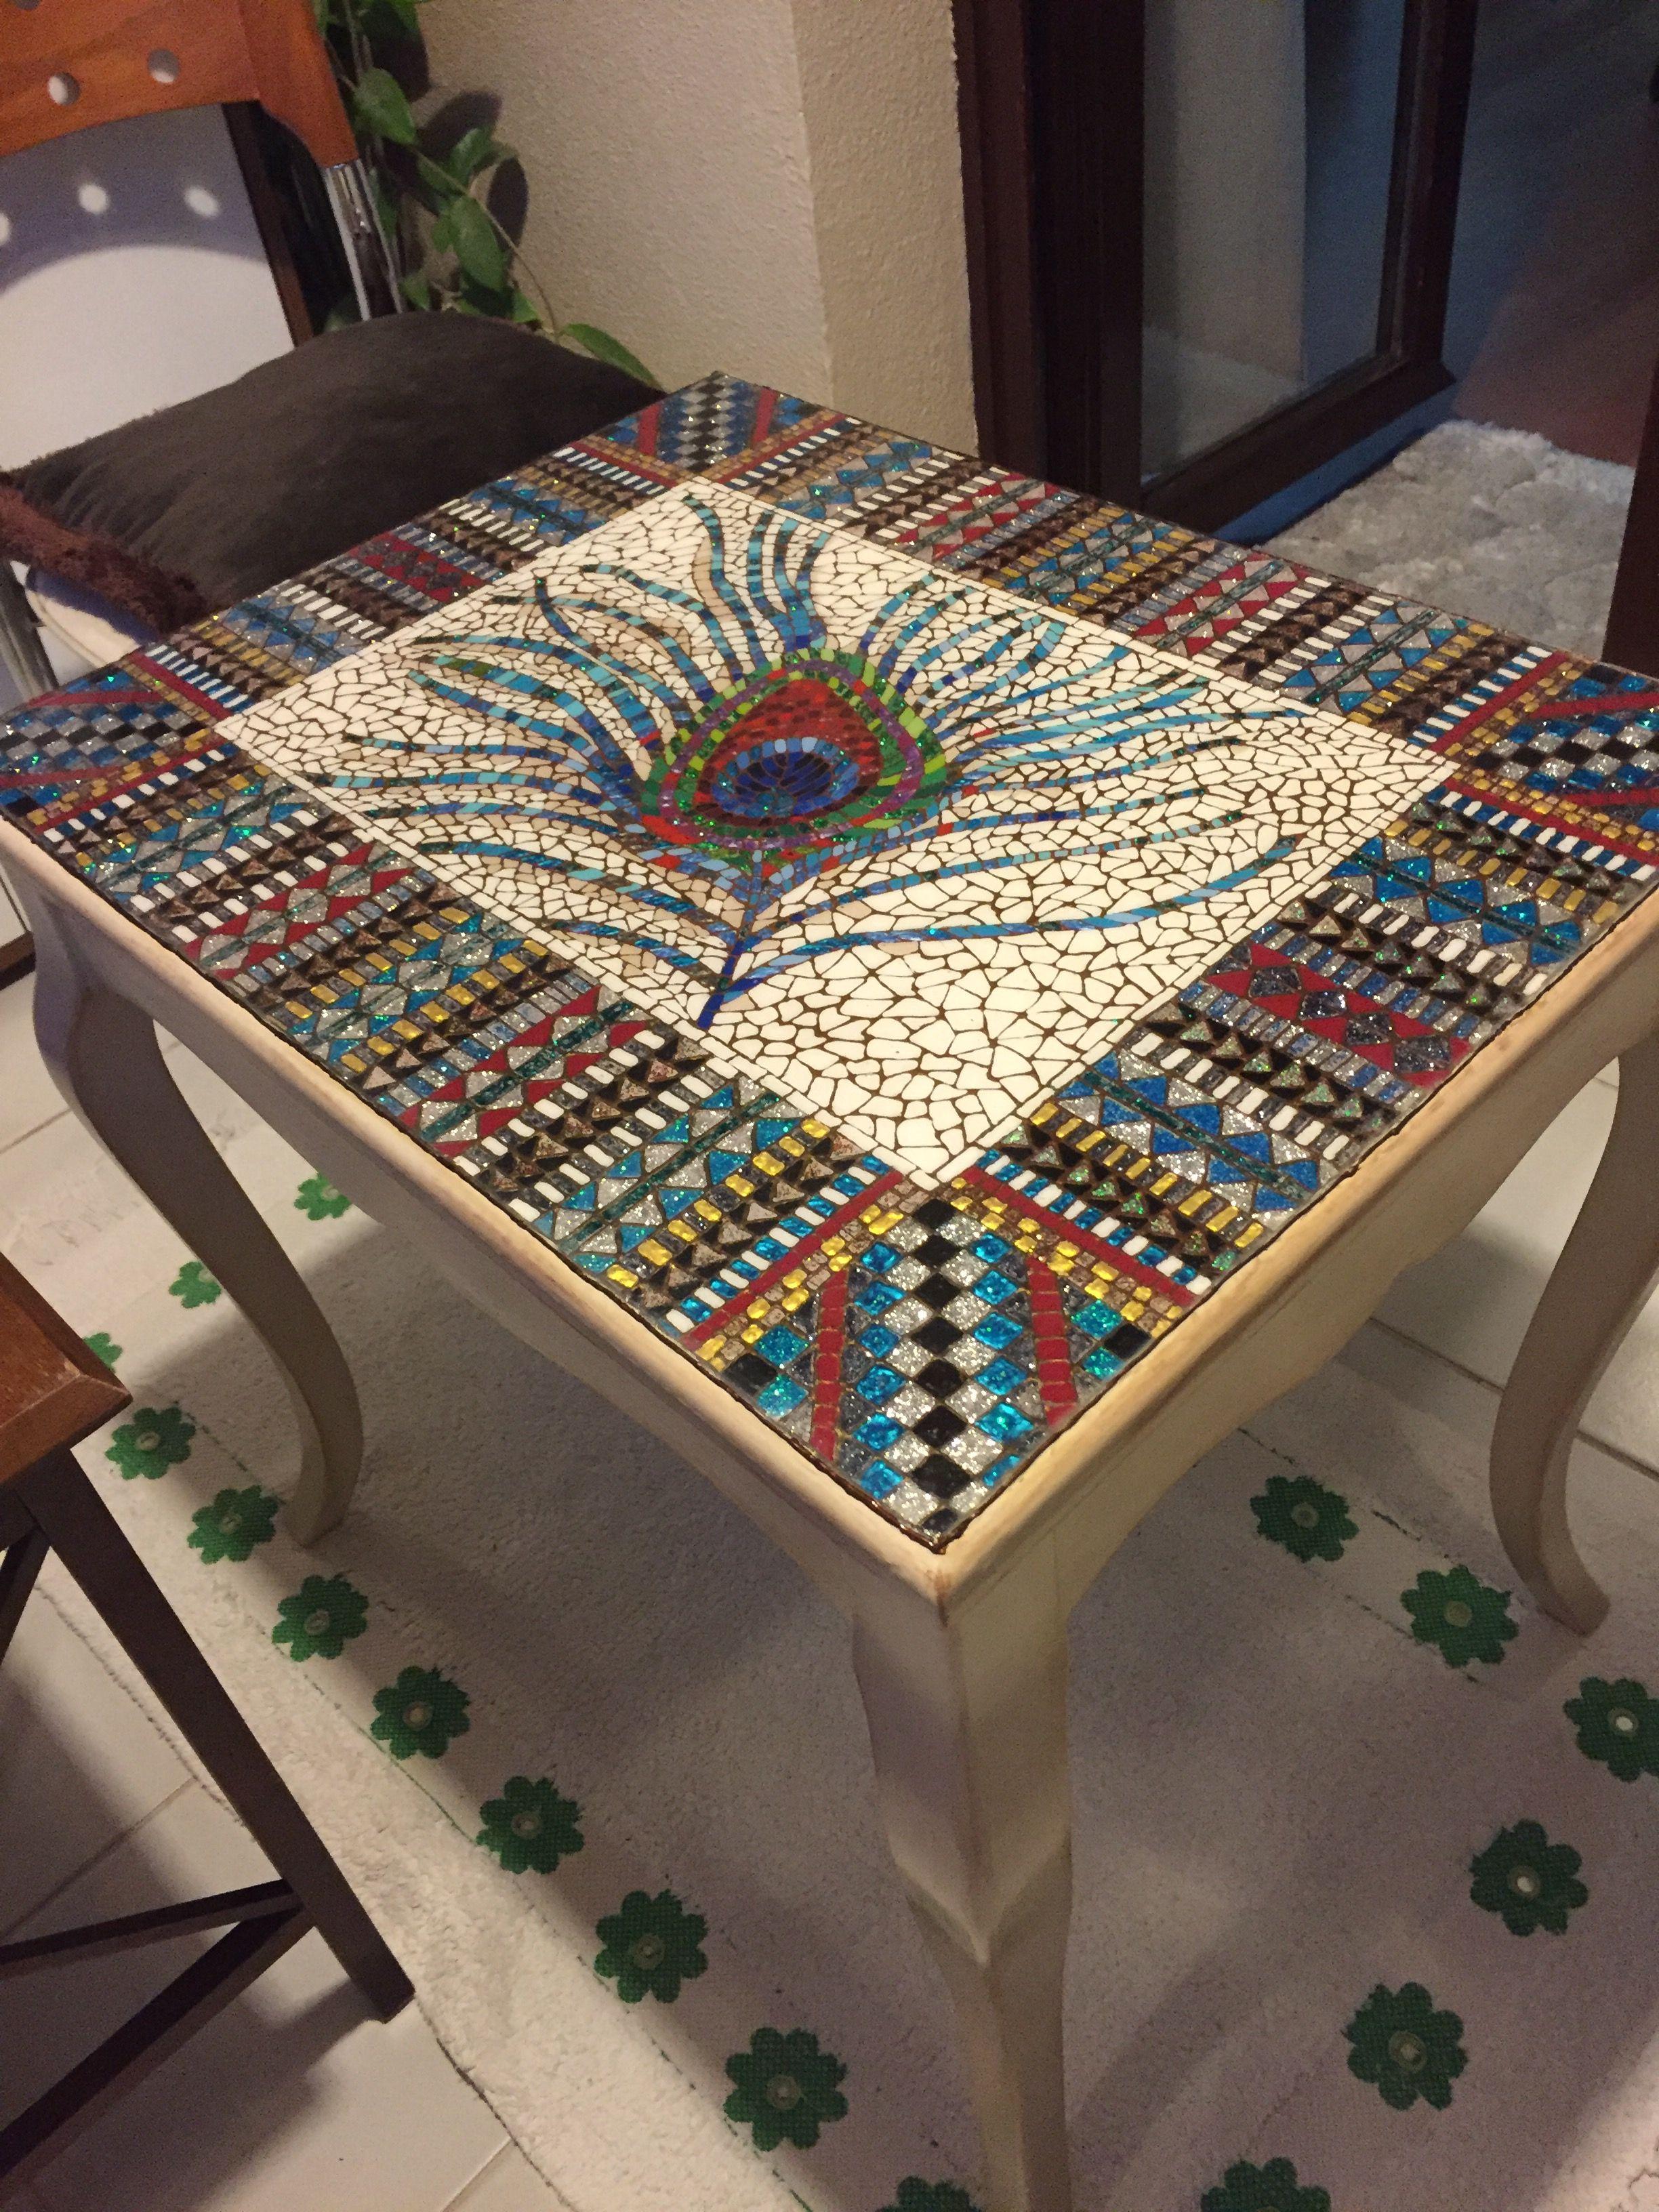 Tisch Mit Mosaikfliesen.Peacock Feather Mosaic Table Top Fliesen Mosaik